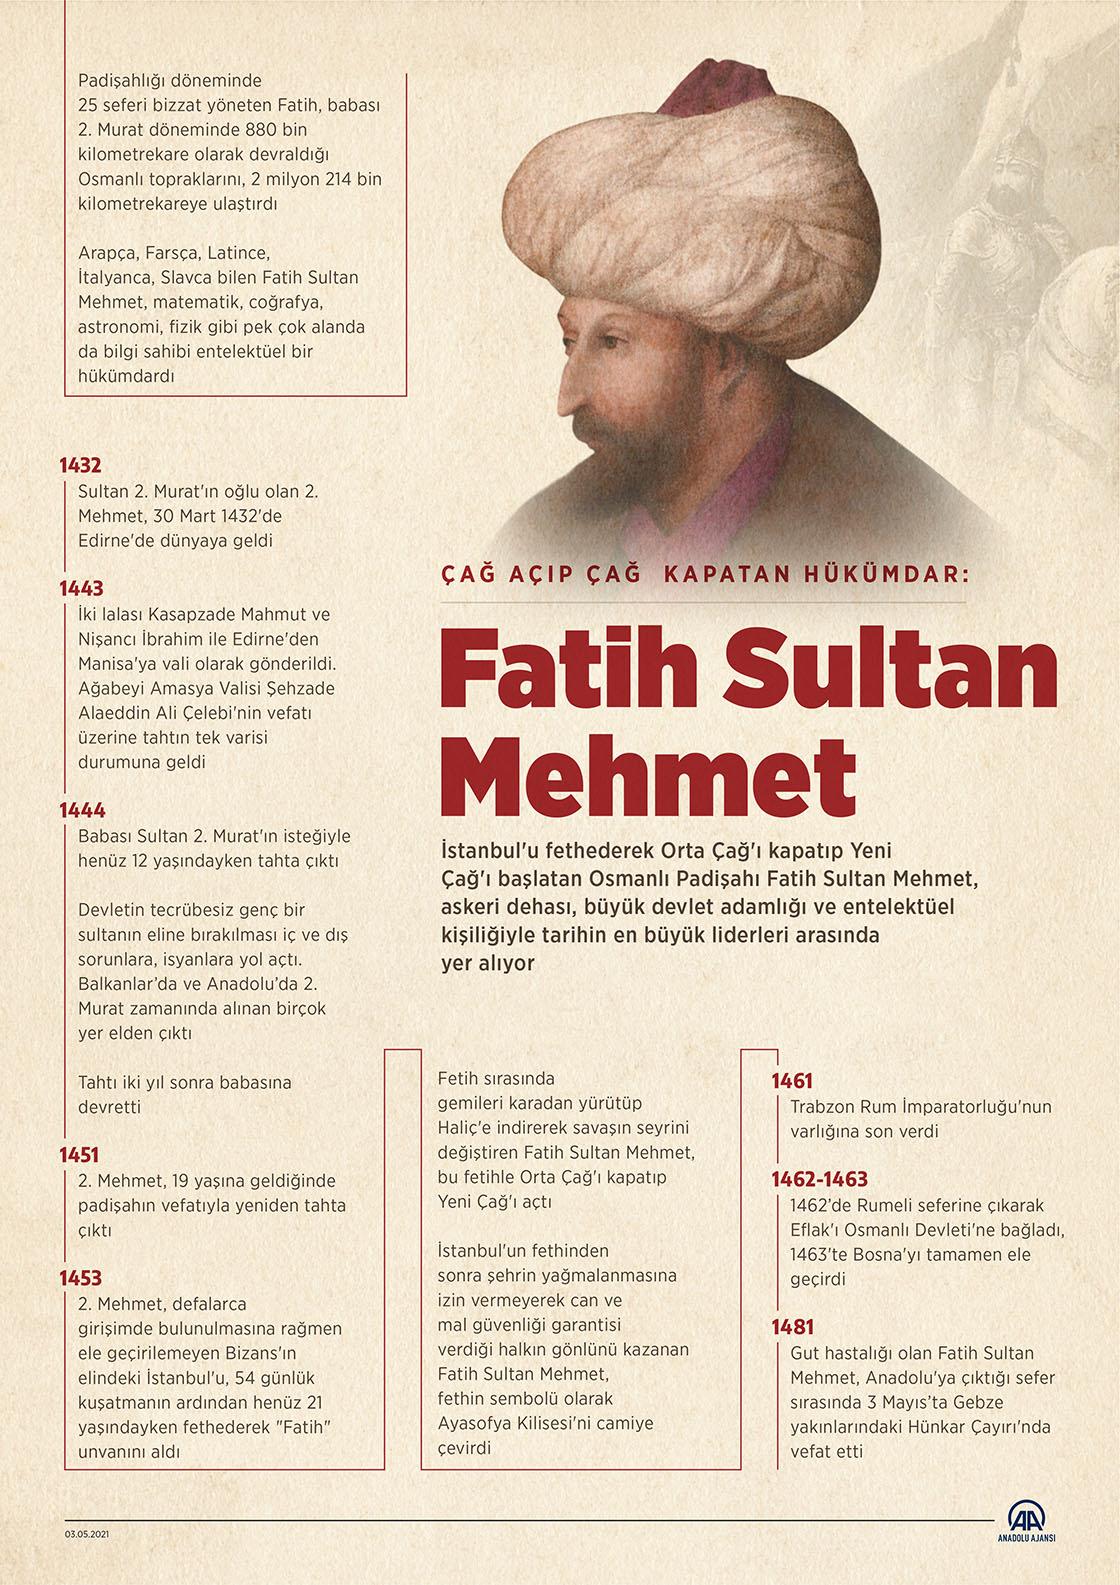 cag-acip-cag-kapatan-hukumdar-fatih-sultan-mehmet.jpg